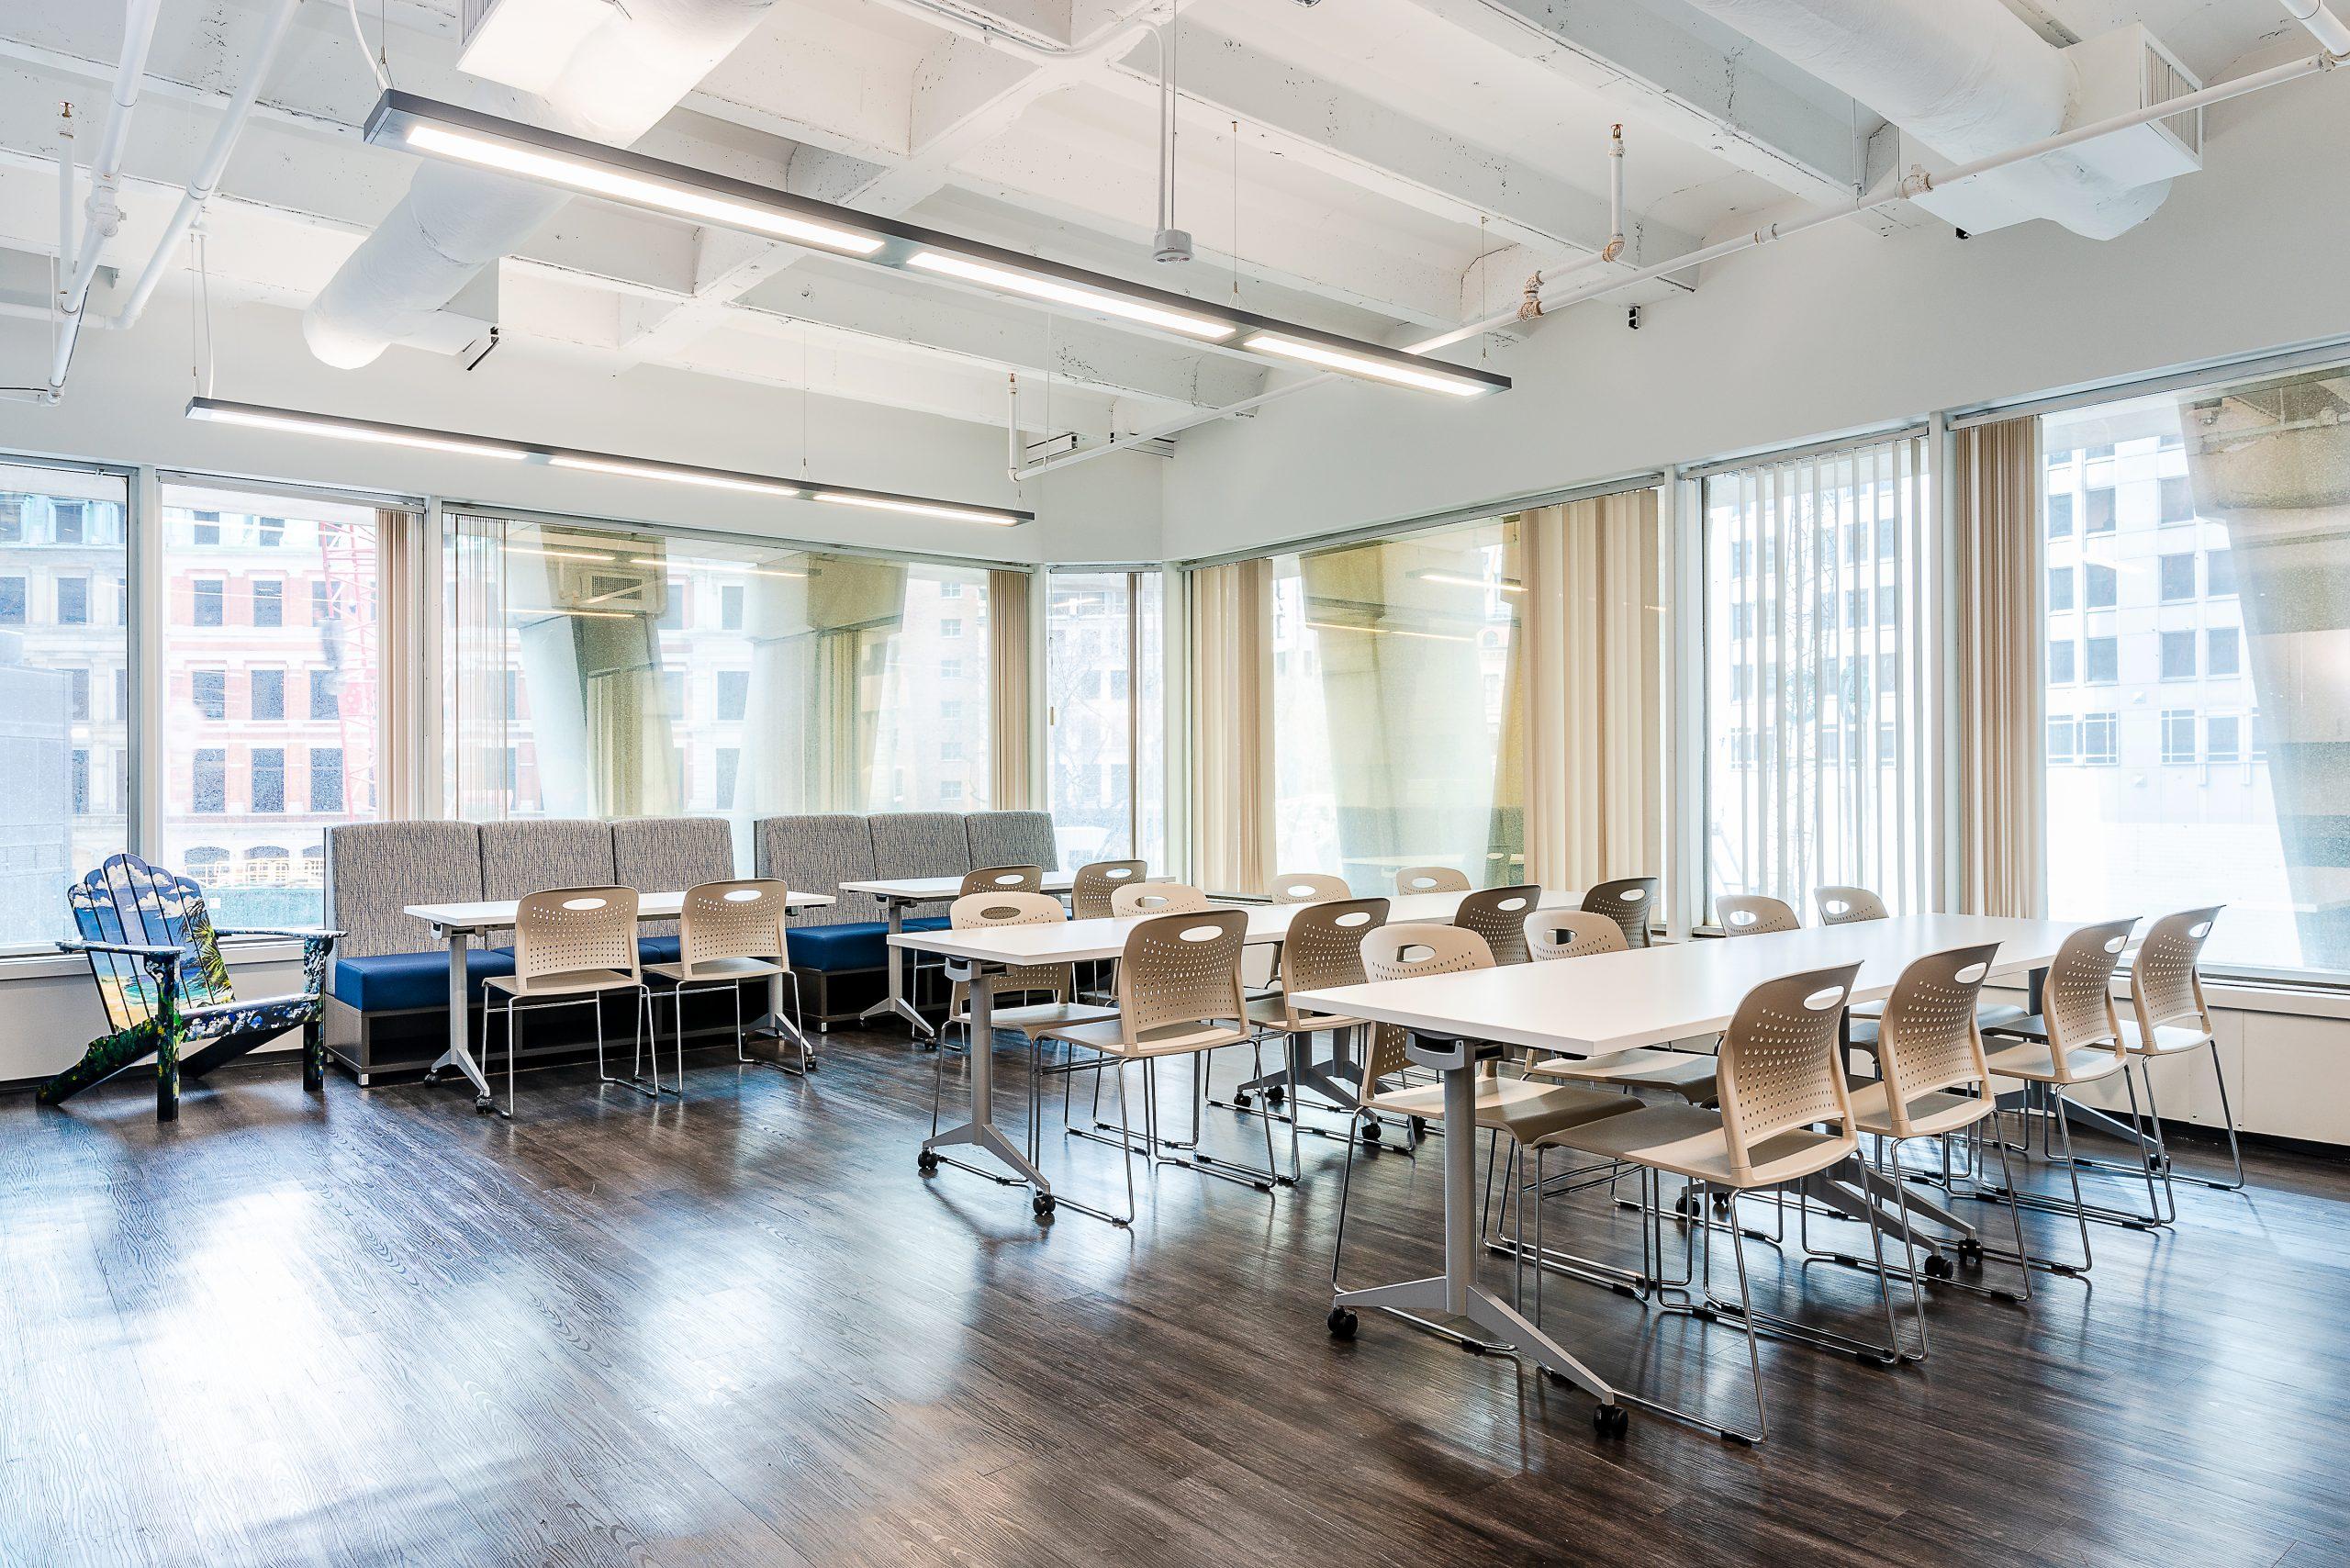 Cafe/Break Room Design Ideas